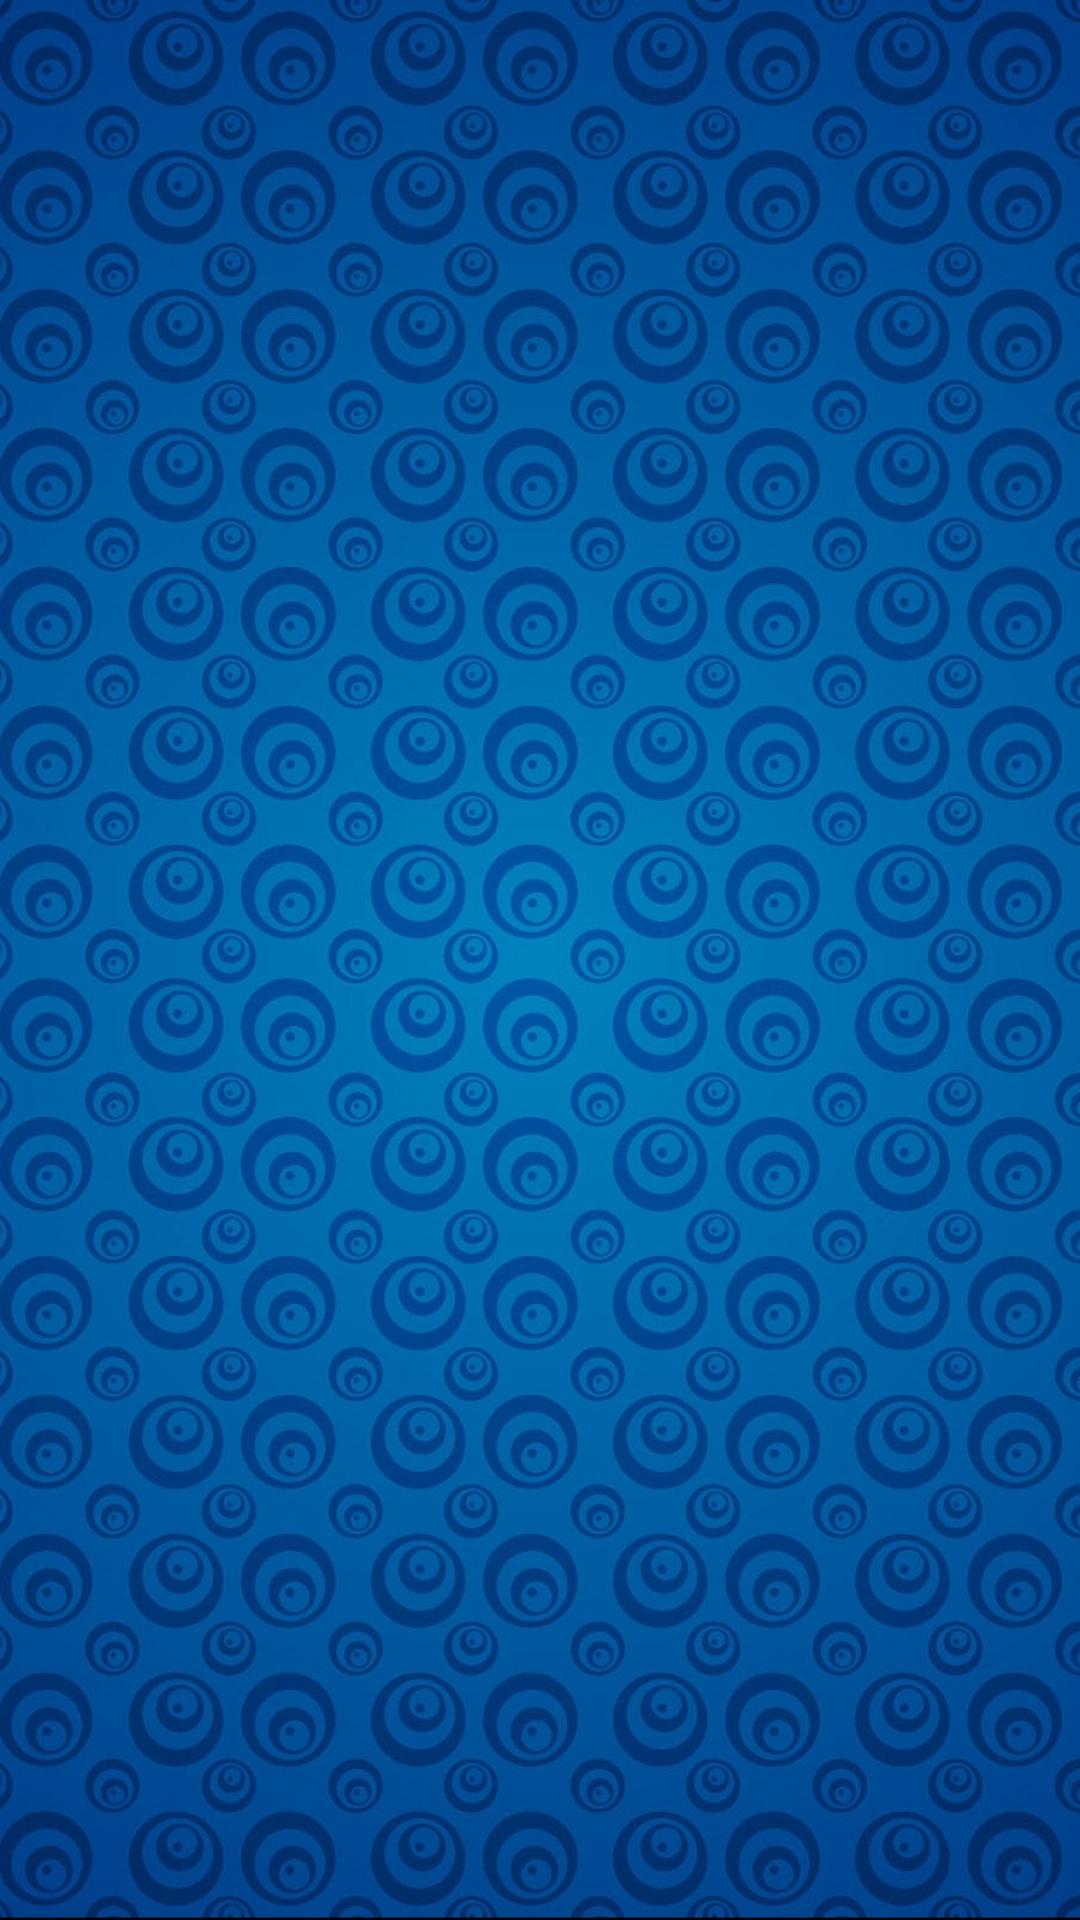 Wallpaper 60832